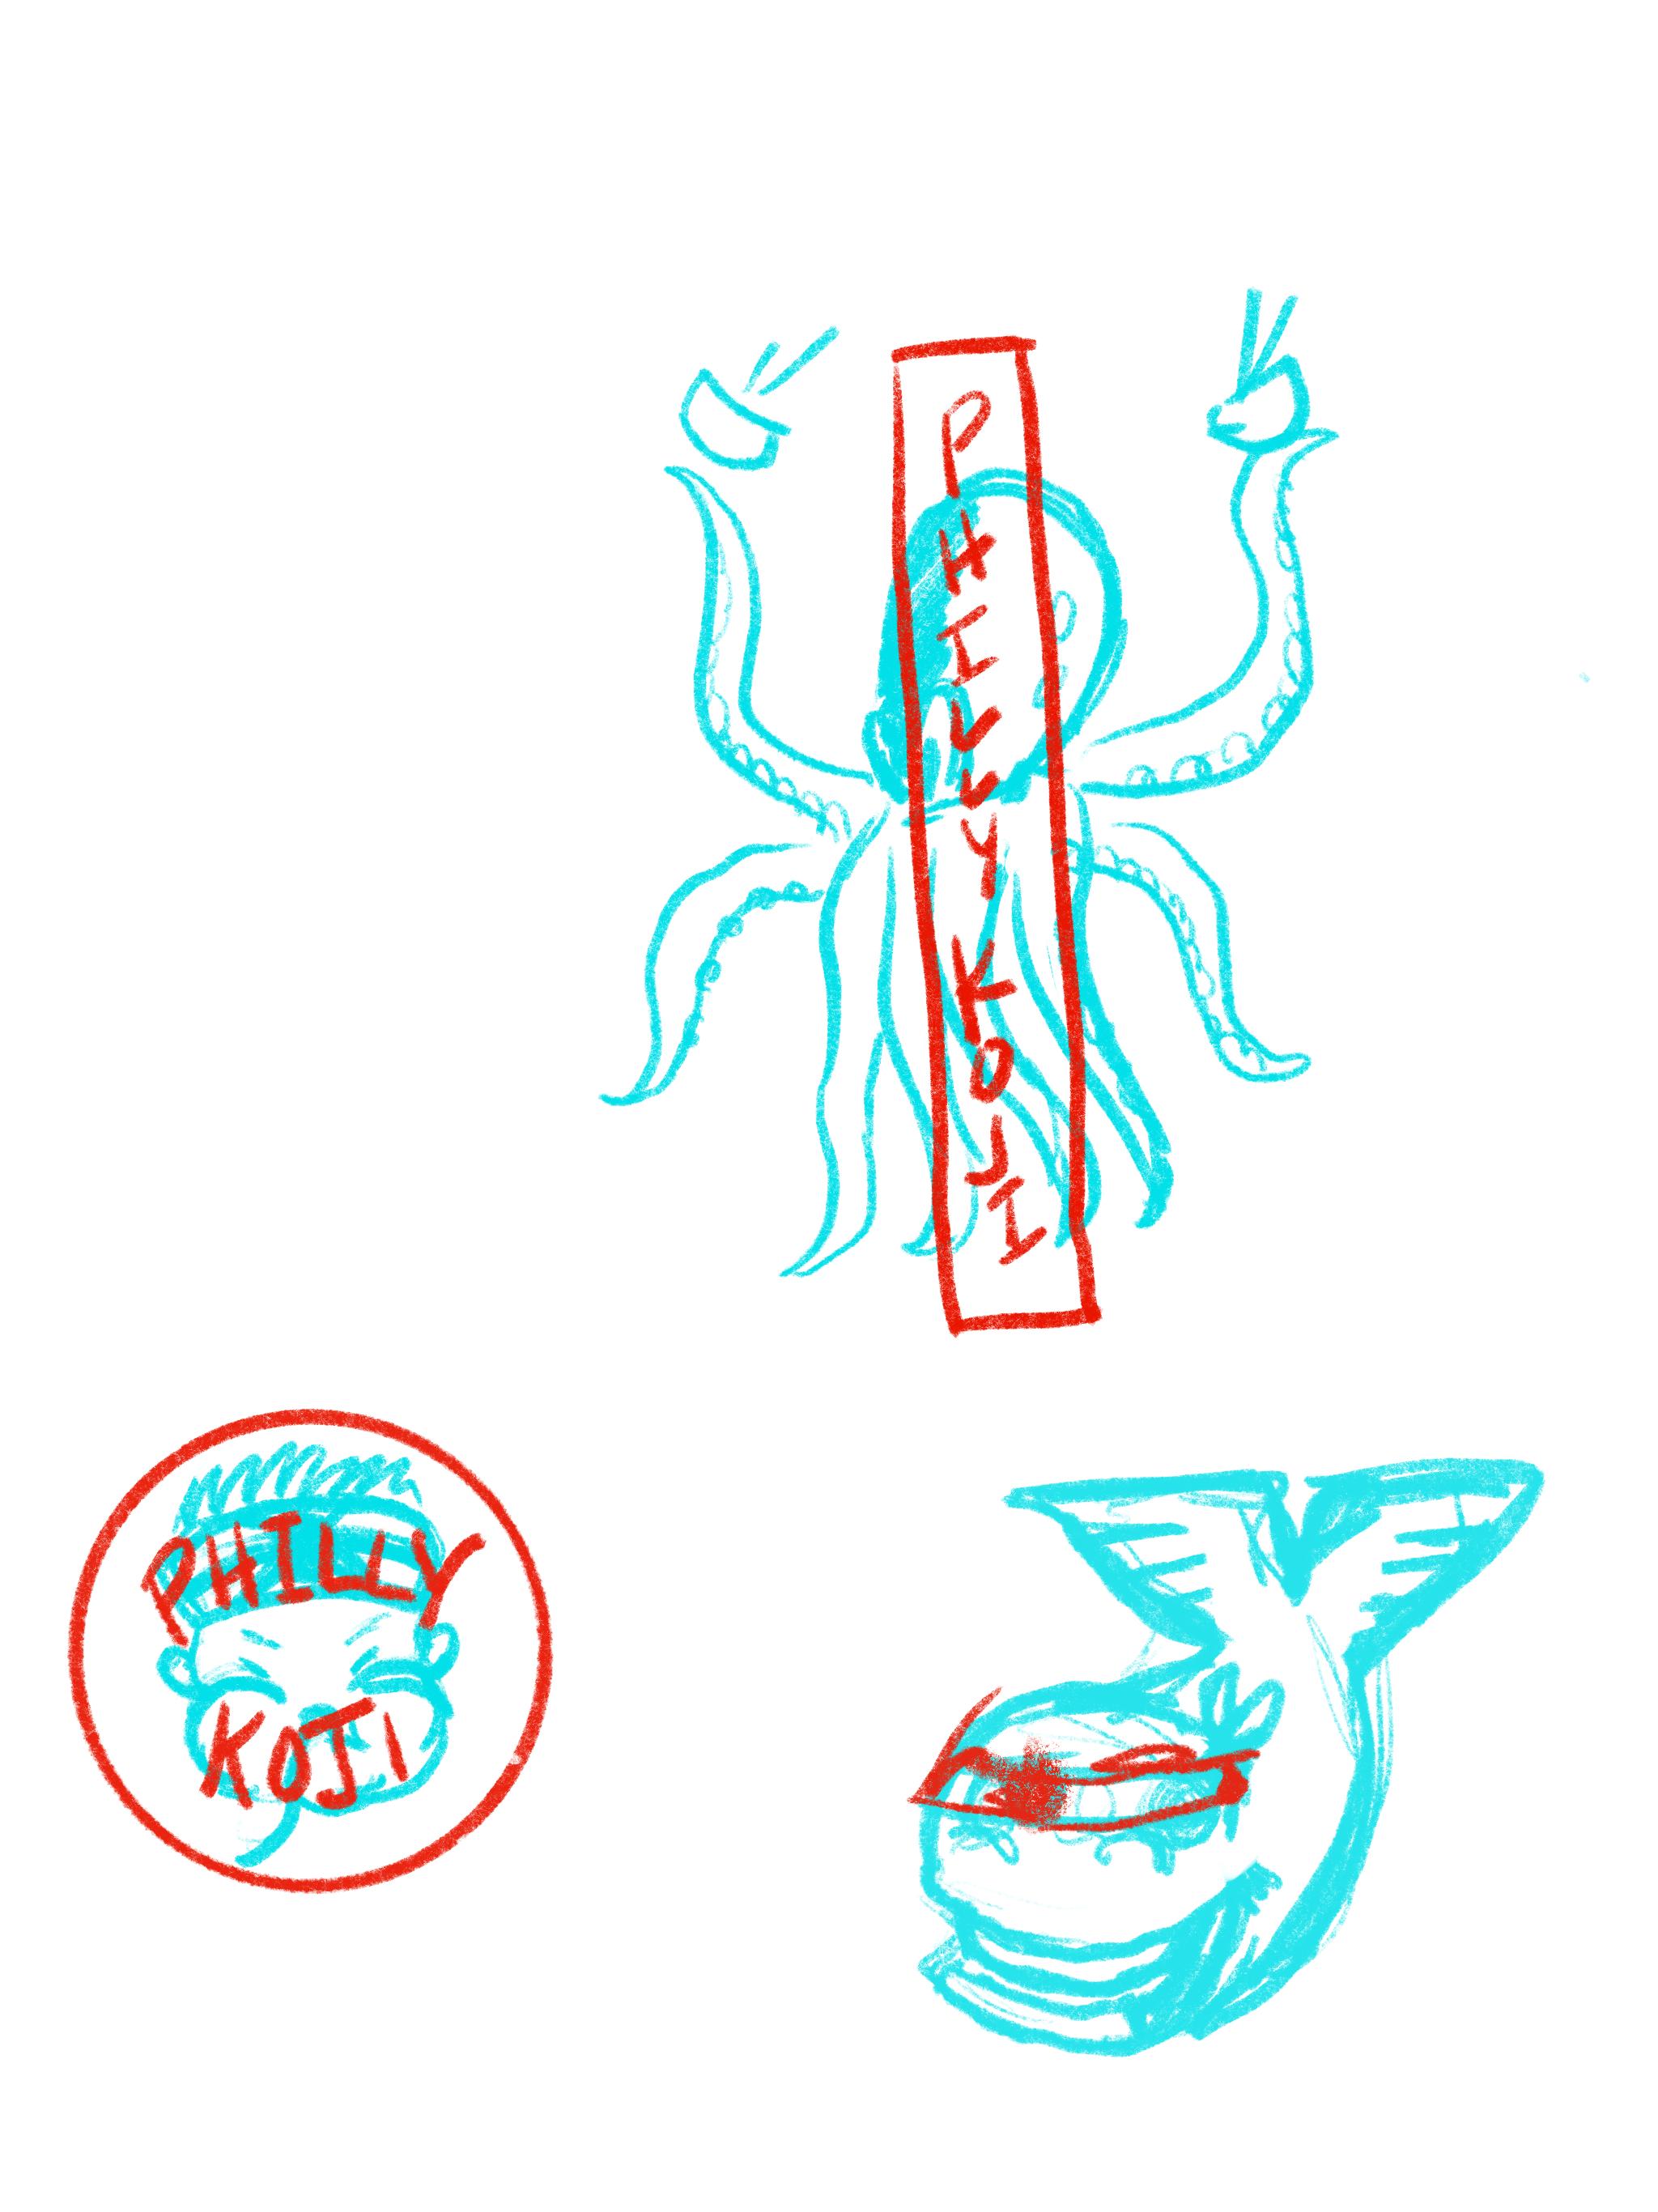 Fig. 5 - Character Explorations